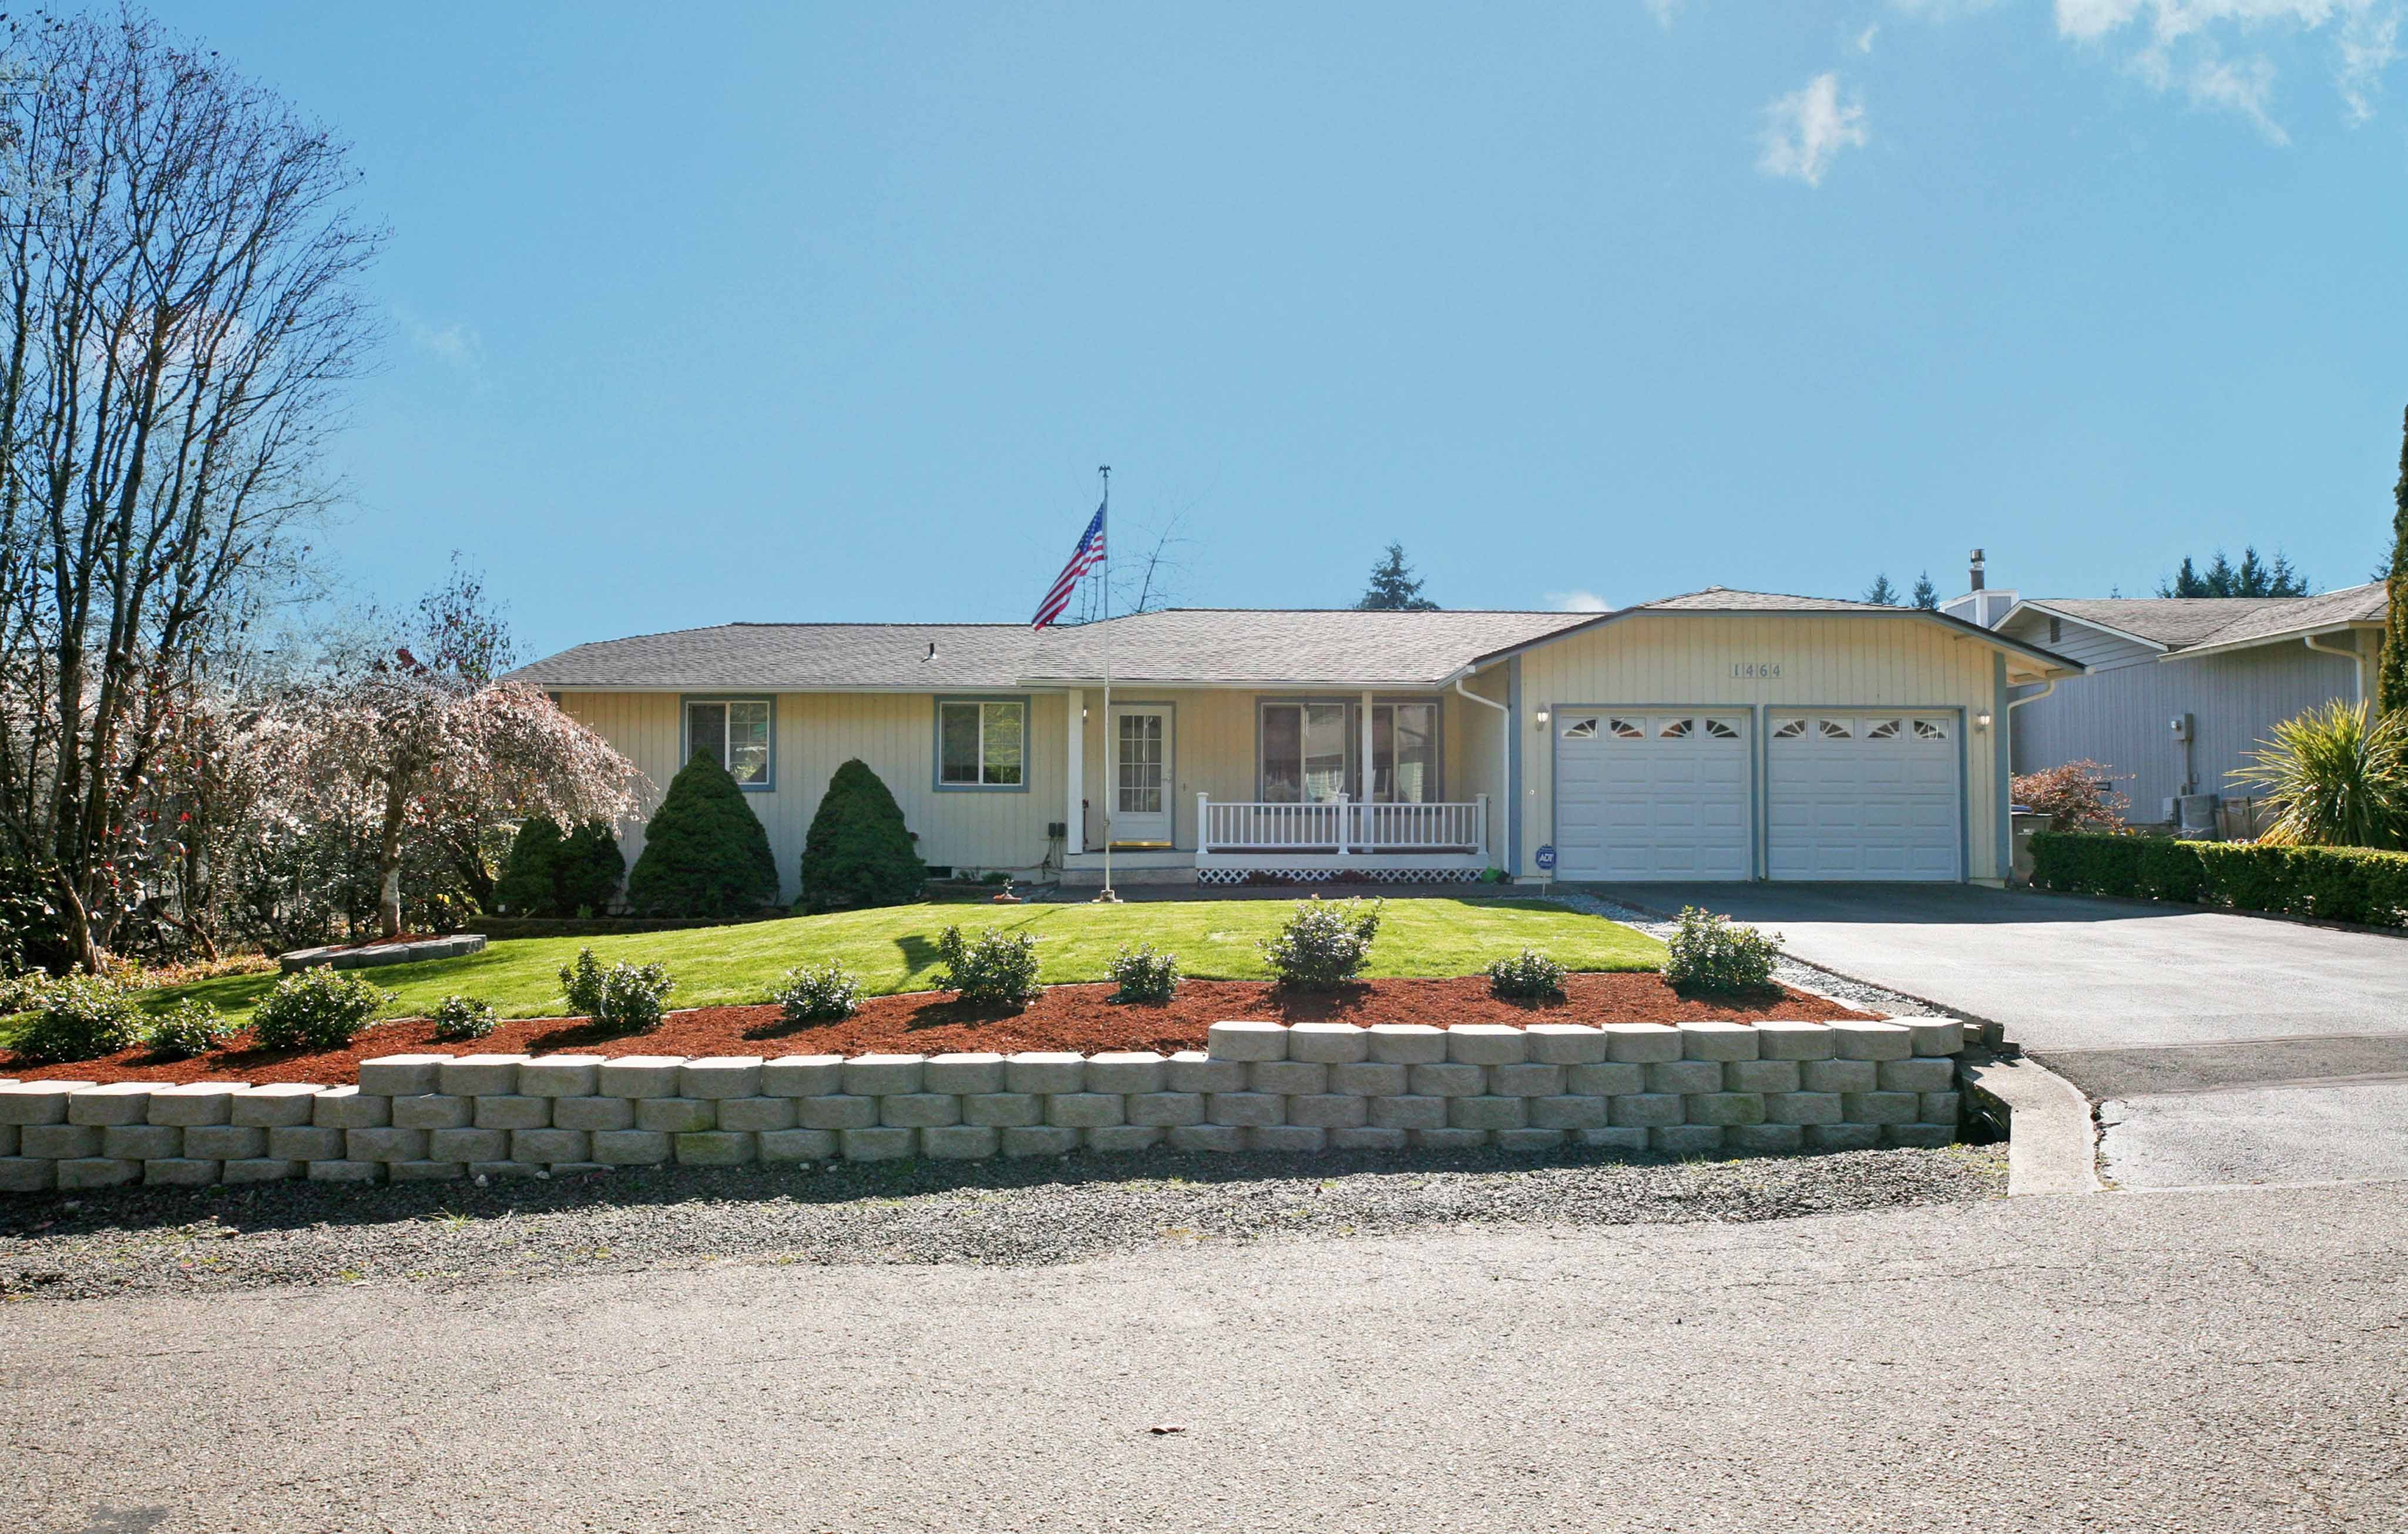 waterfront homes for sale bremerton wa